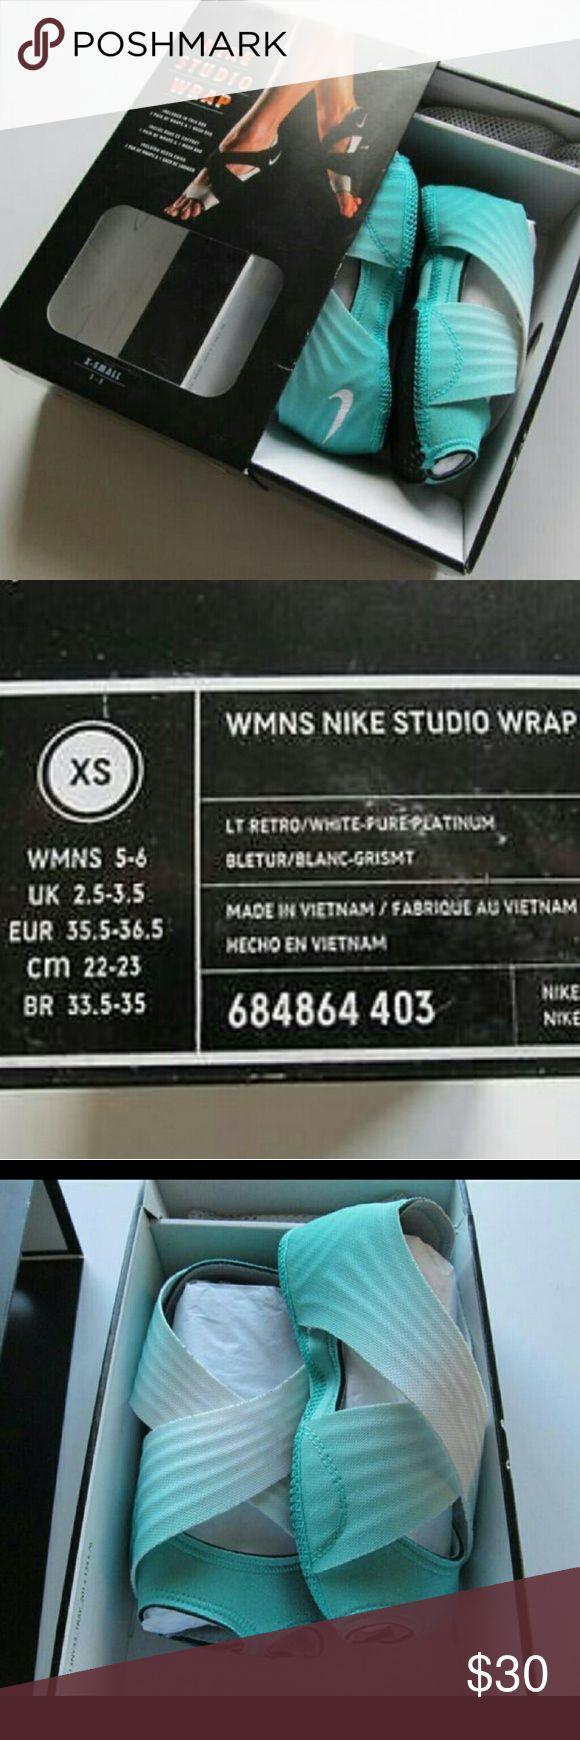 Fitness tools nike studio wraps - Nwt Nike Studio Wrap Dance Yoga Barre Shoe Nwt